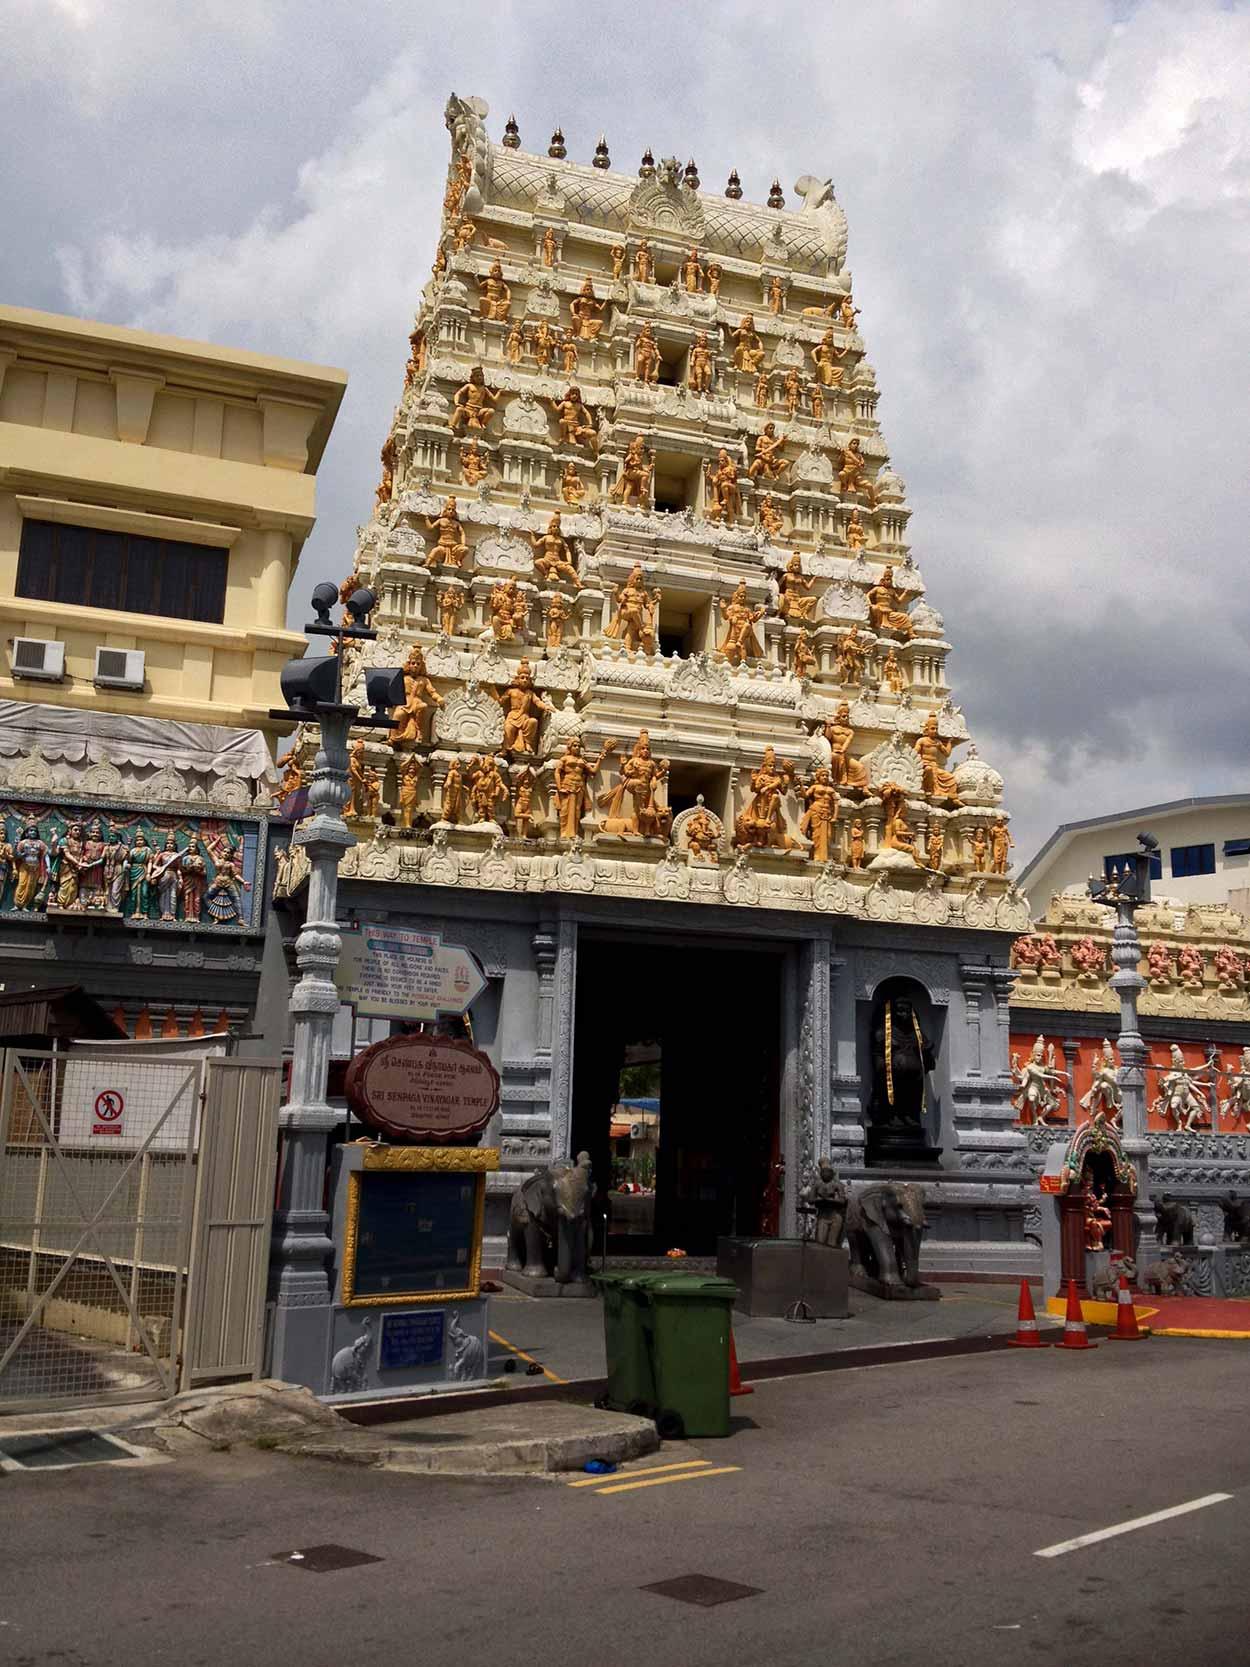 Sri Senpaga Vinayagar Temple on Ceylon Road, Joo Chiat, Singapore